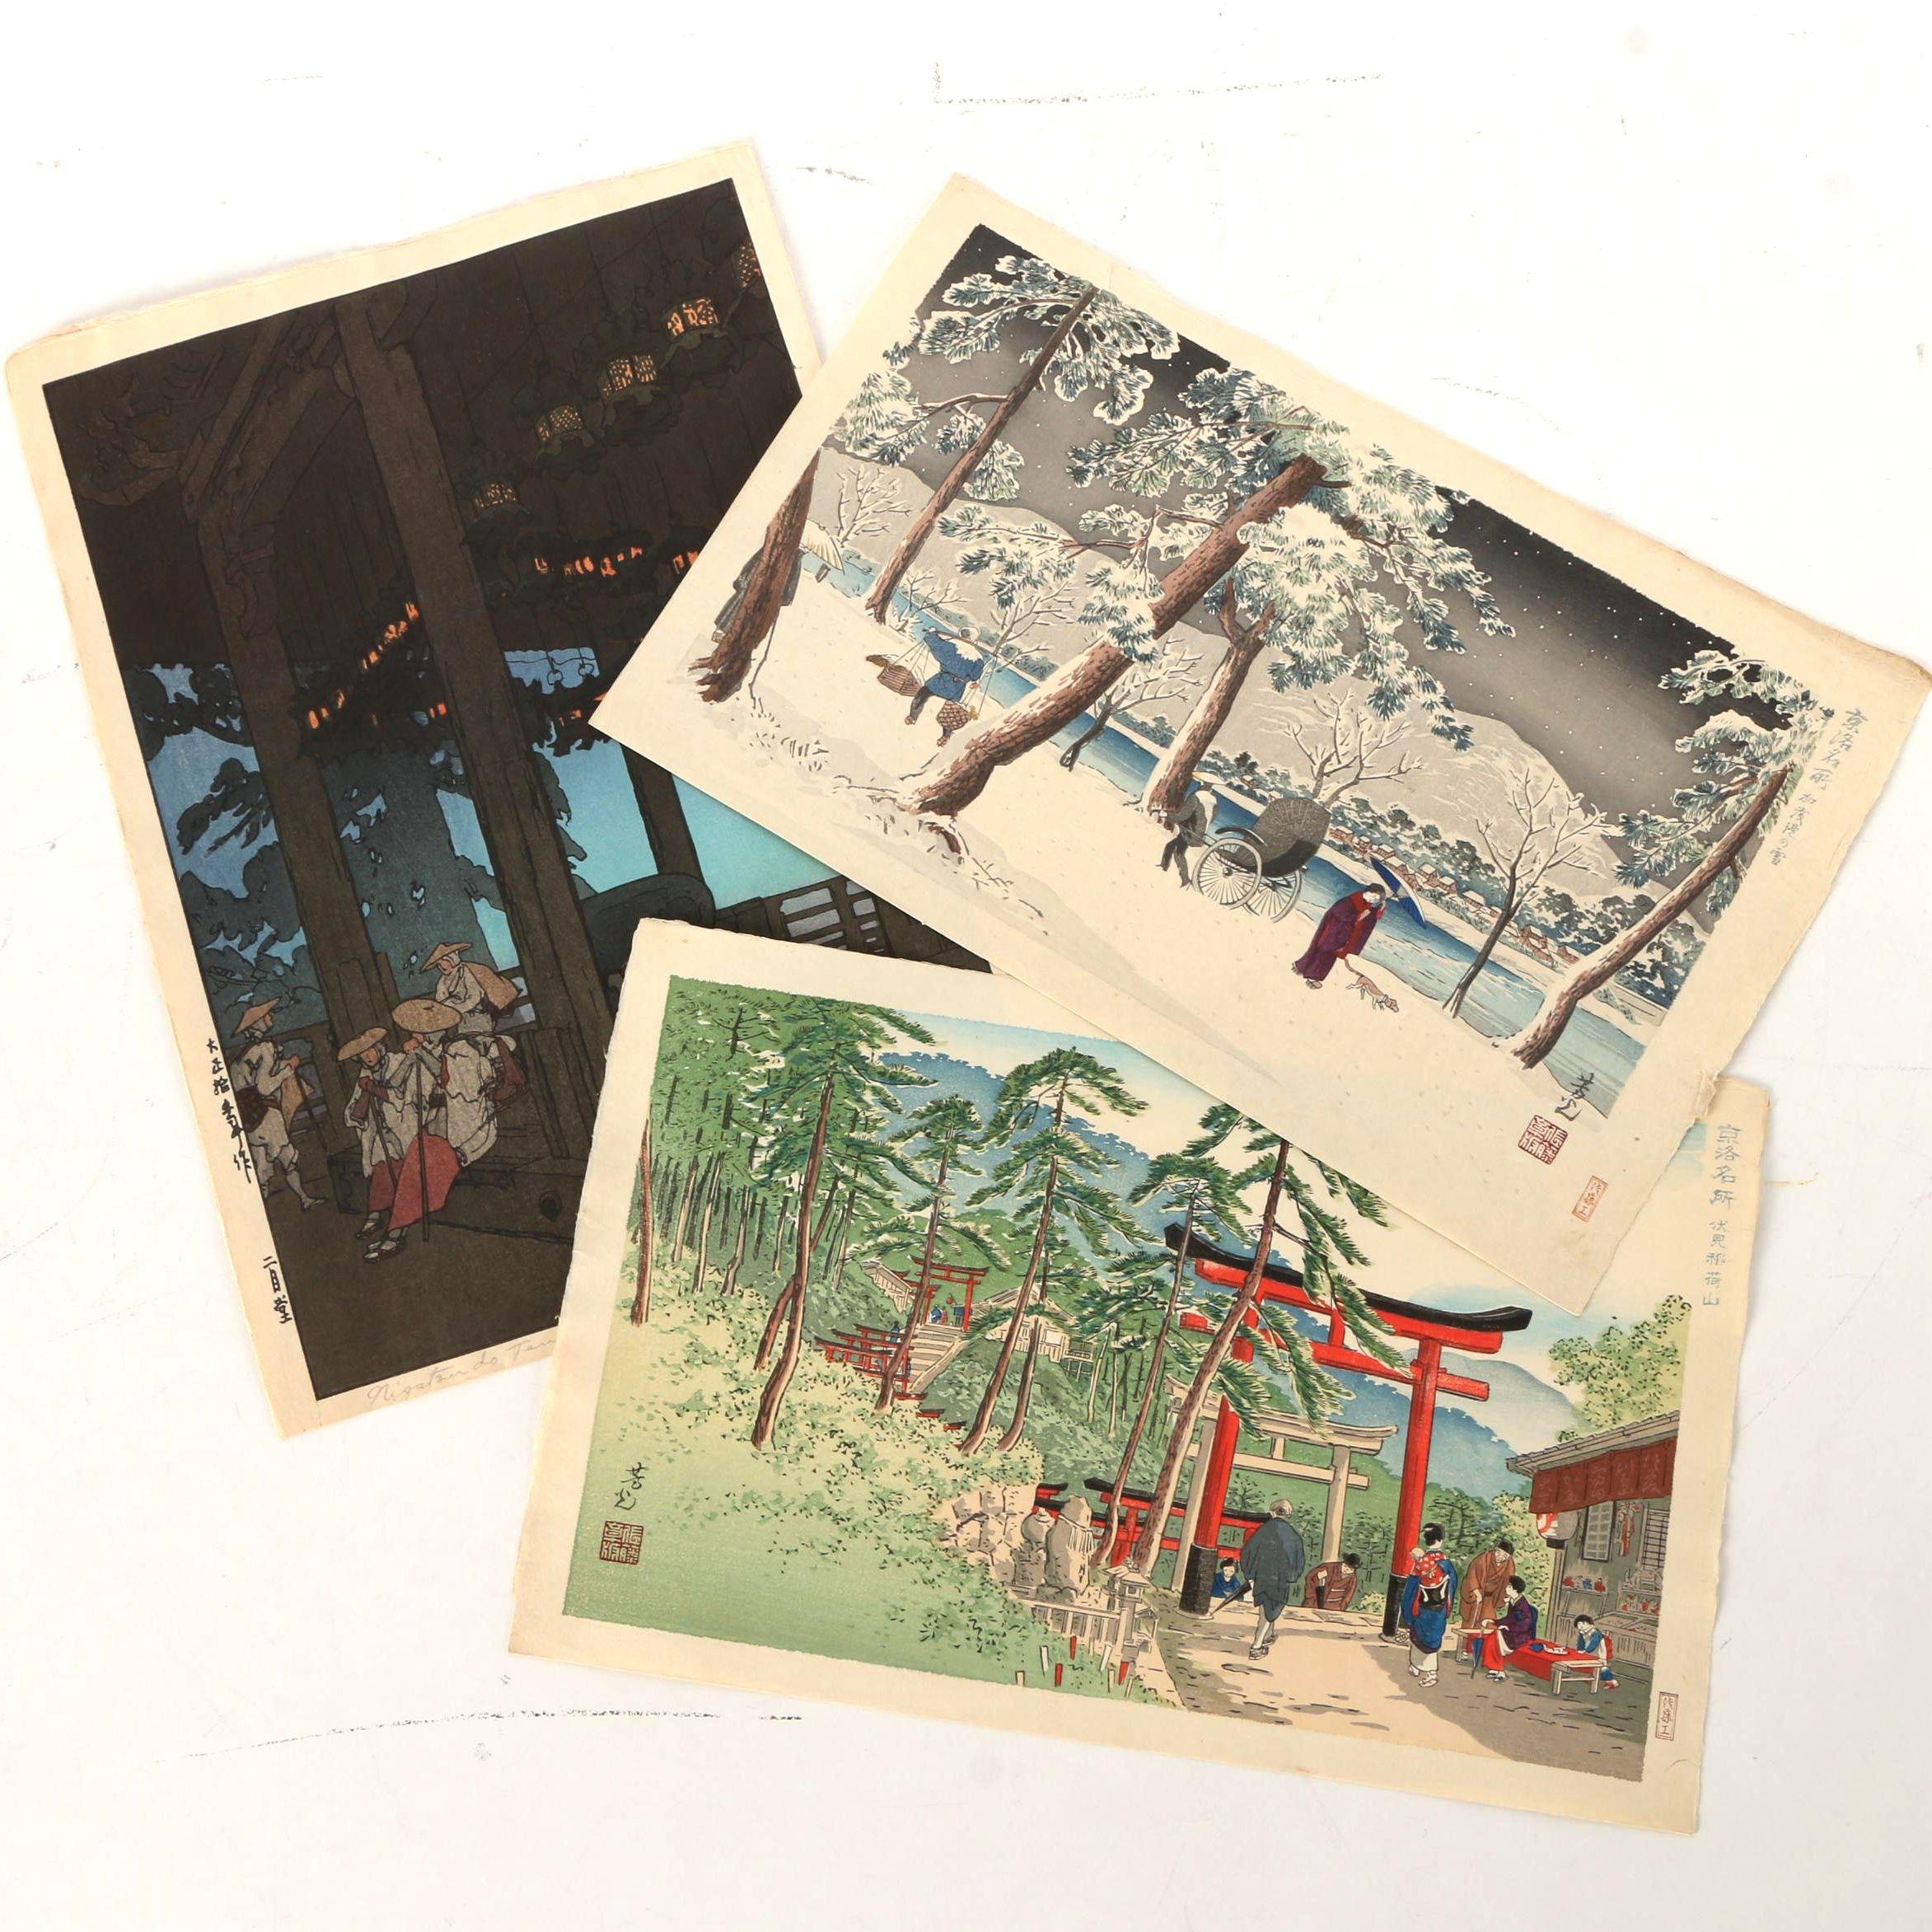 Nomura Yoshimitsu and Yoshida Hiroshi Japanese Shin-hanga Woodblock Prints